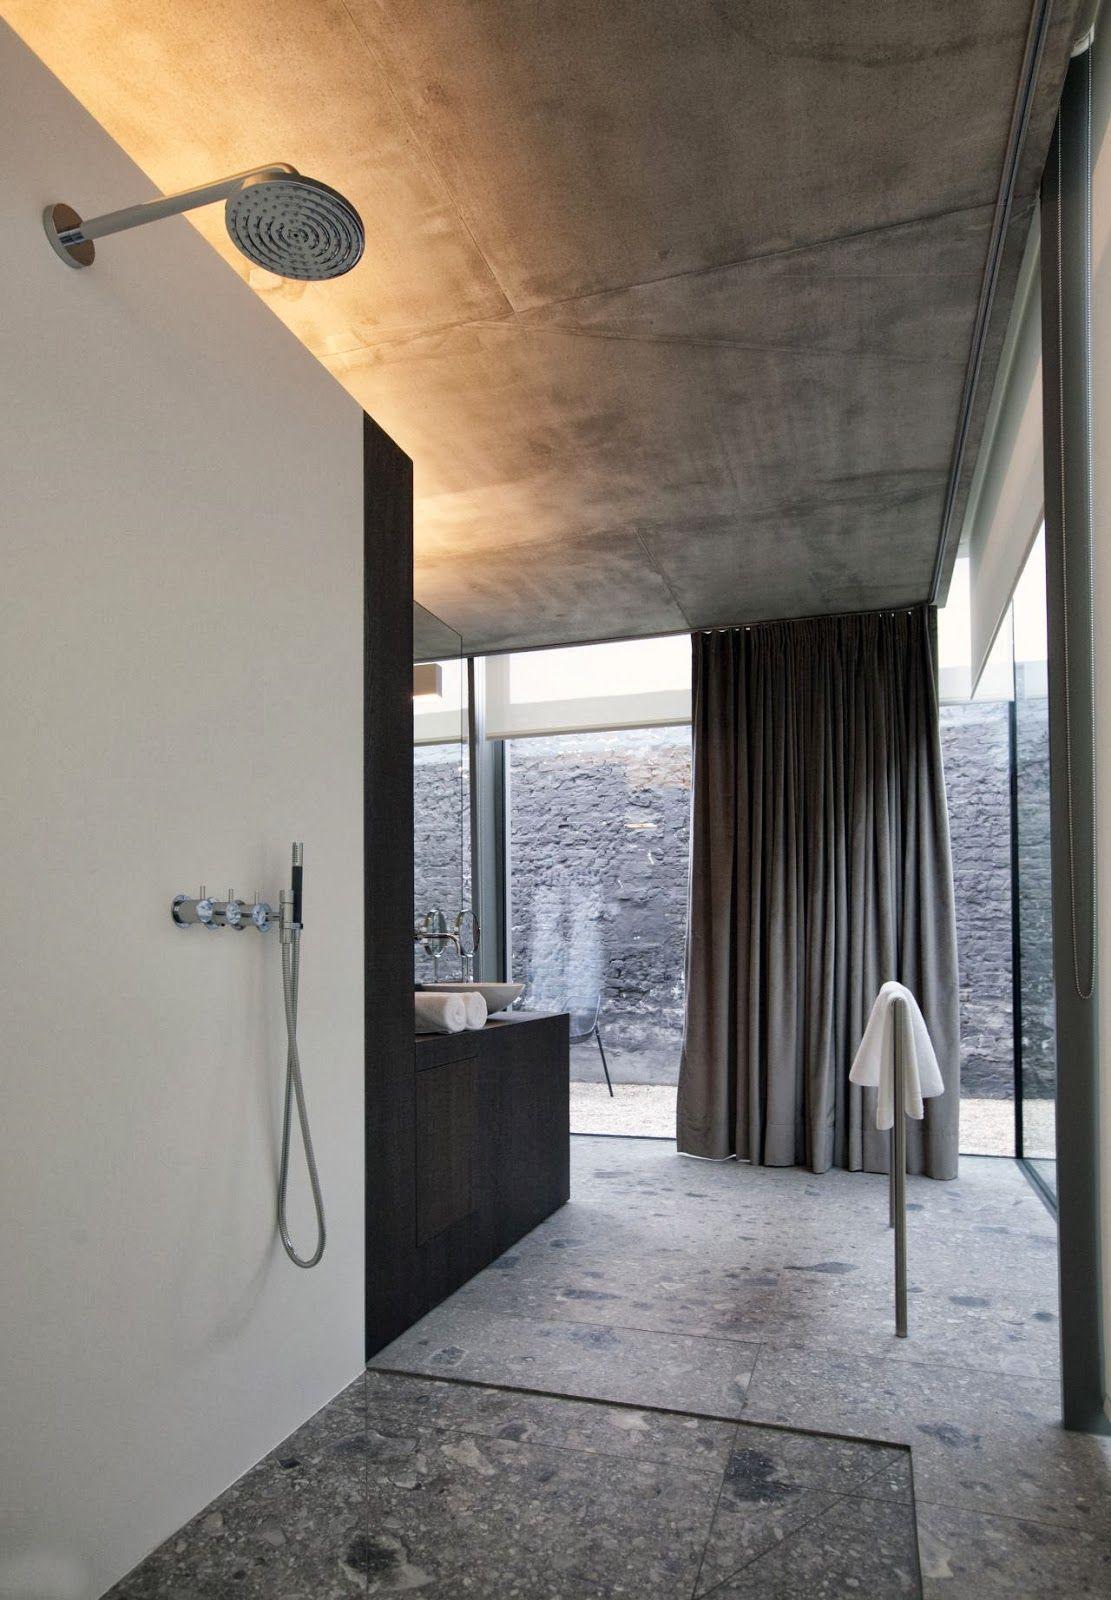 Notarishuys Hotel Belgium With Images Minimalism Interior